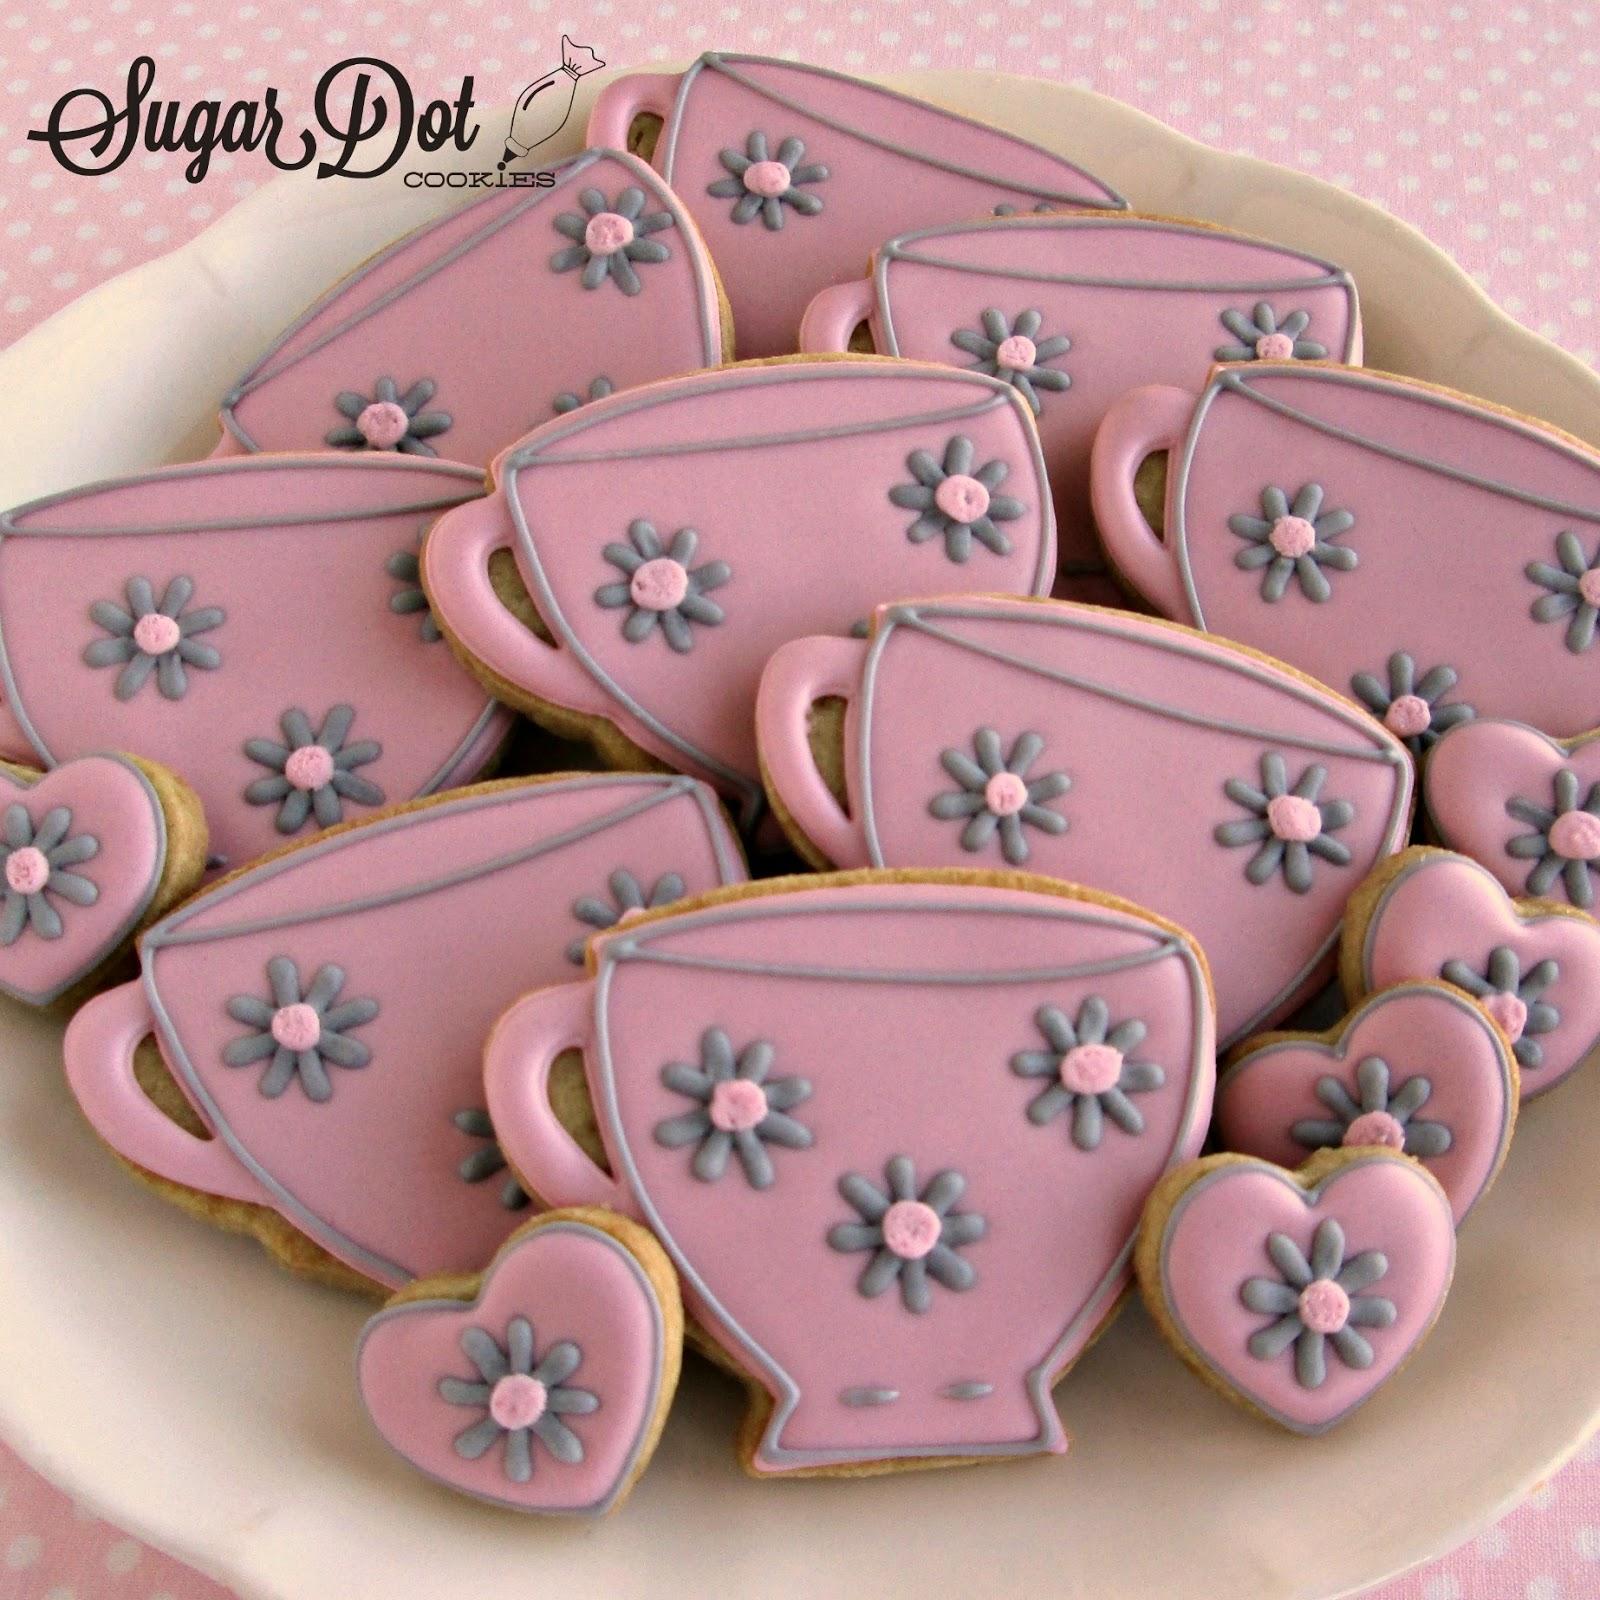 Sugar Dot Cookies: Sugar Cookies for a Tea Party Bridal Shower